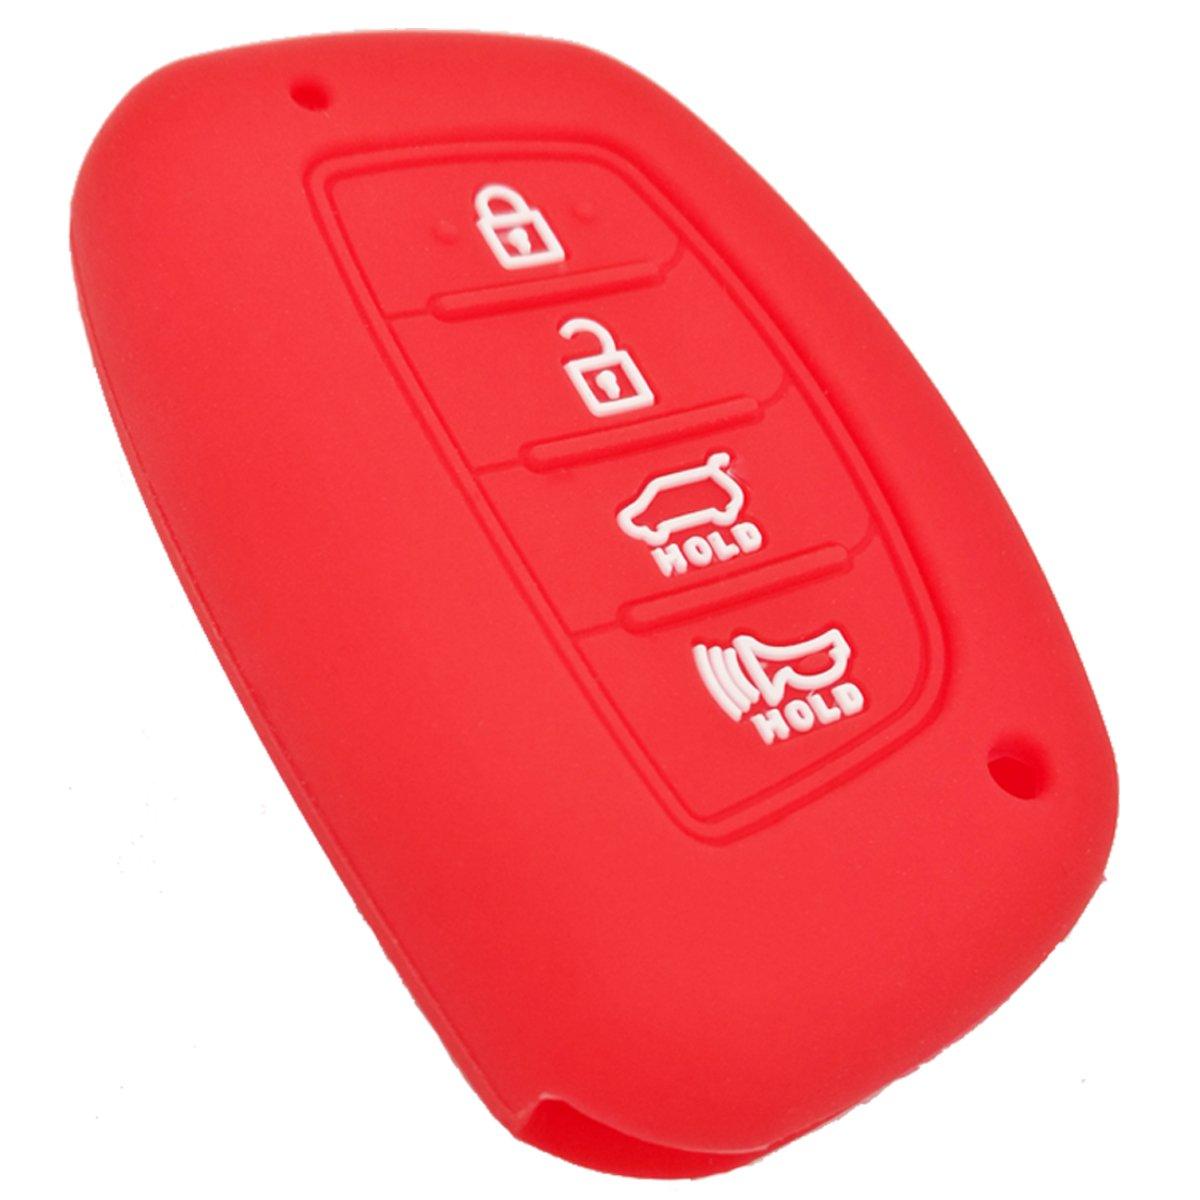 Coolbestda Silicone Protective Fob Remote Key Cover Case Skin Jacket for Hyundai Elantra Sonata Tucson I40 IX35 I45 Smart 4 Buttons Black